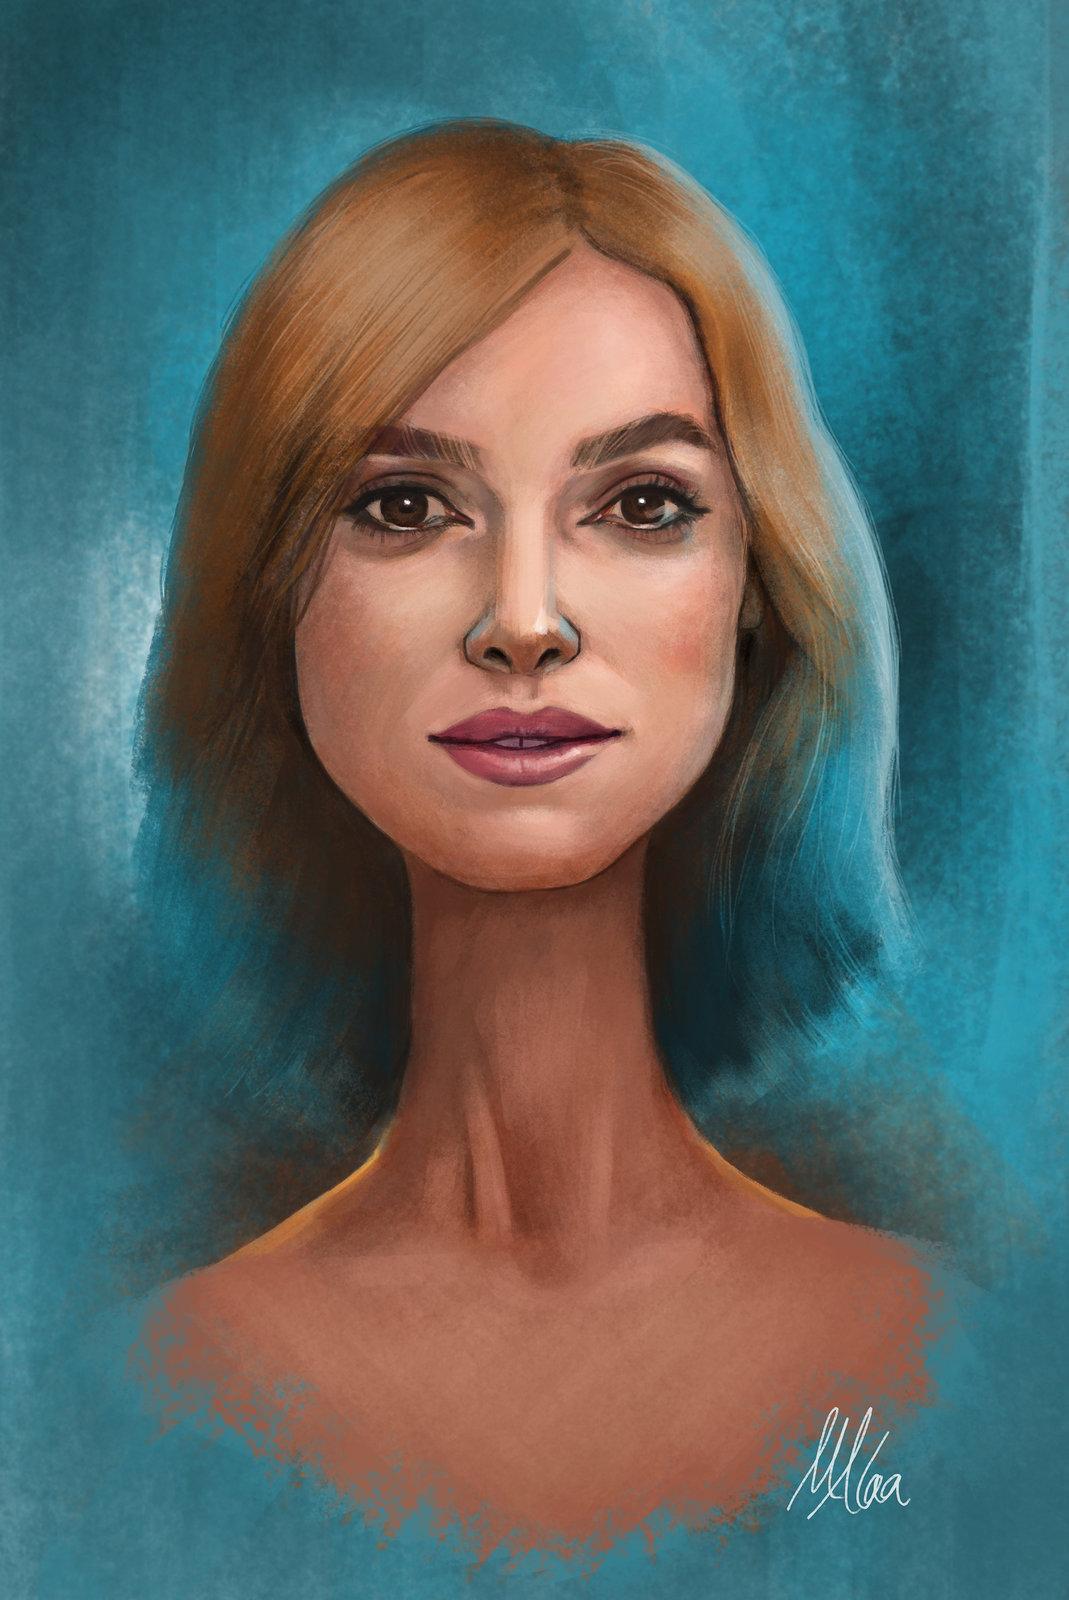 Keira Knightley's Portrait